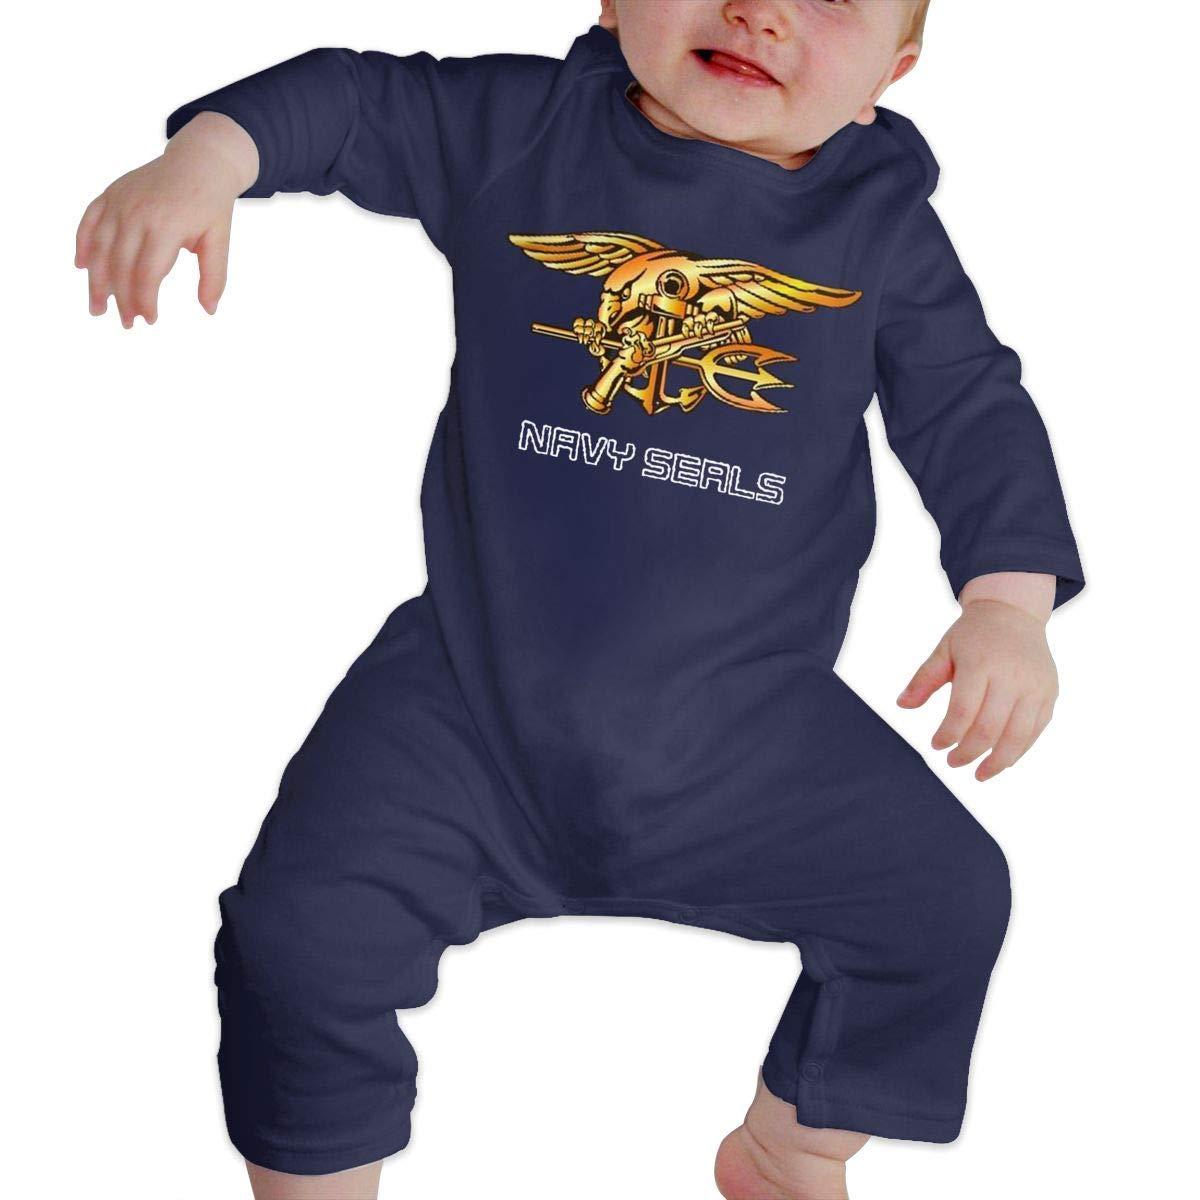 GLGFashion Unisex US Navy Seal Newborn Baby 6-24 Months Baby Climbing Clothing Baby Long Sleeve Garment Black Tute da Bambino Body Pausa